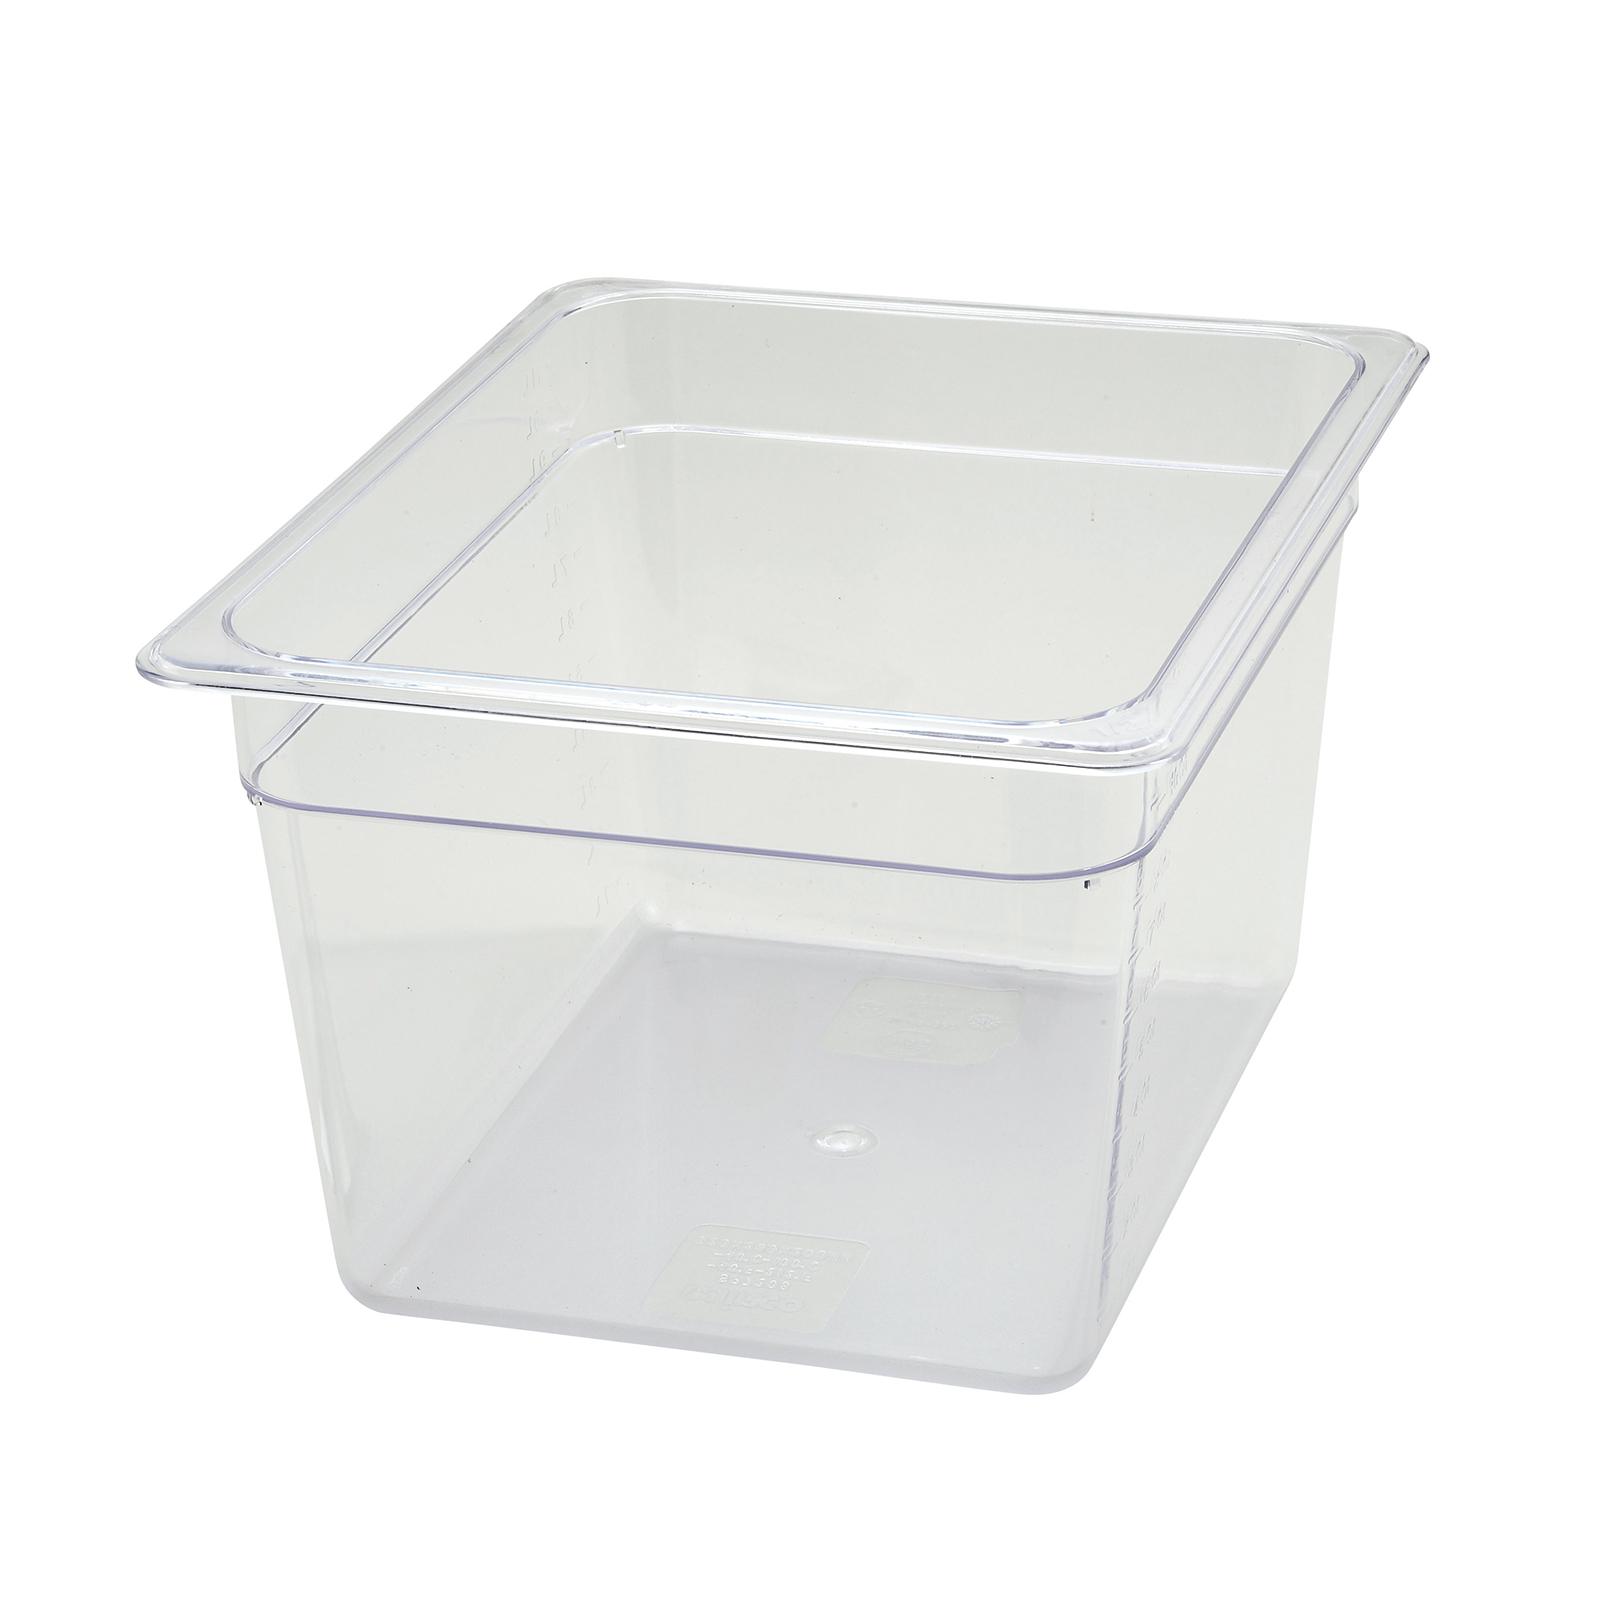 Winco SP7208 food pan, plastic